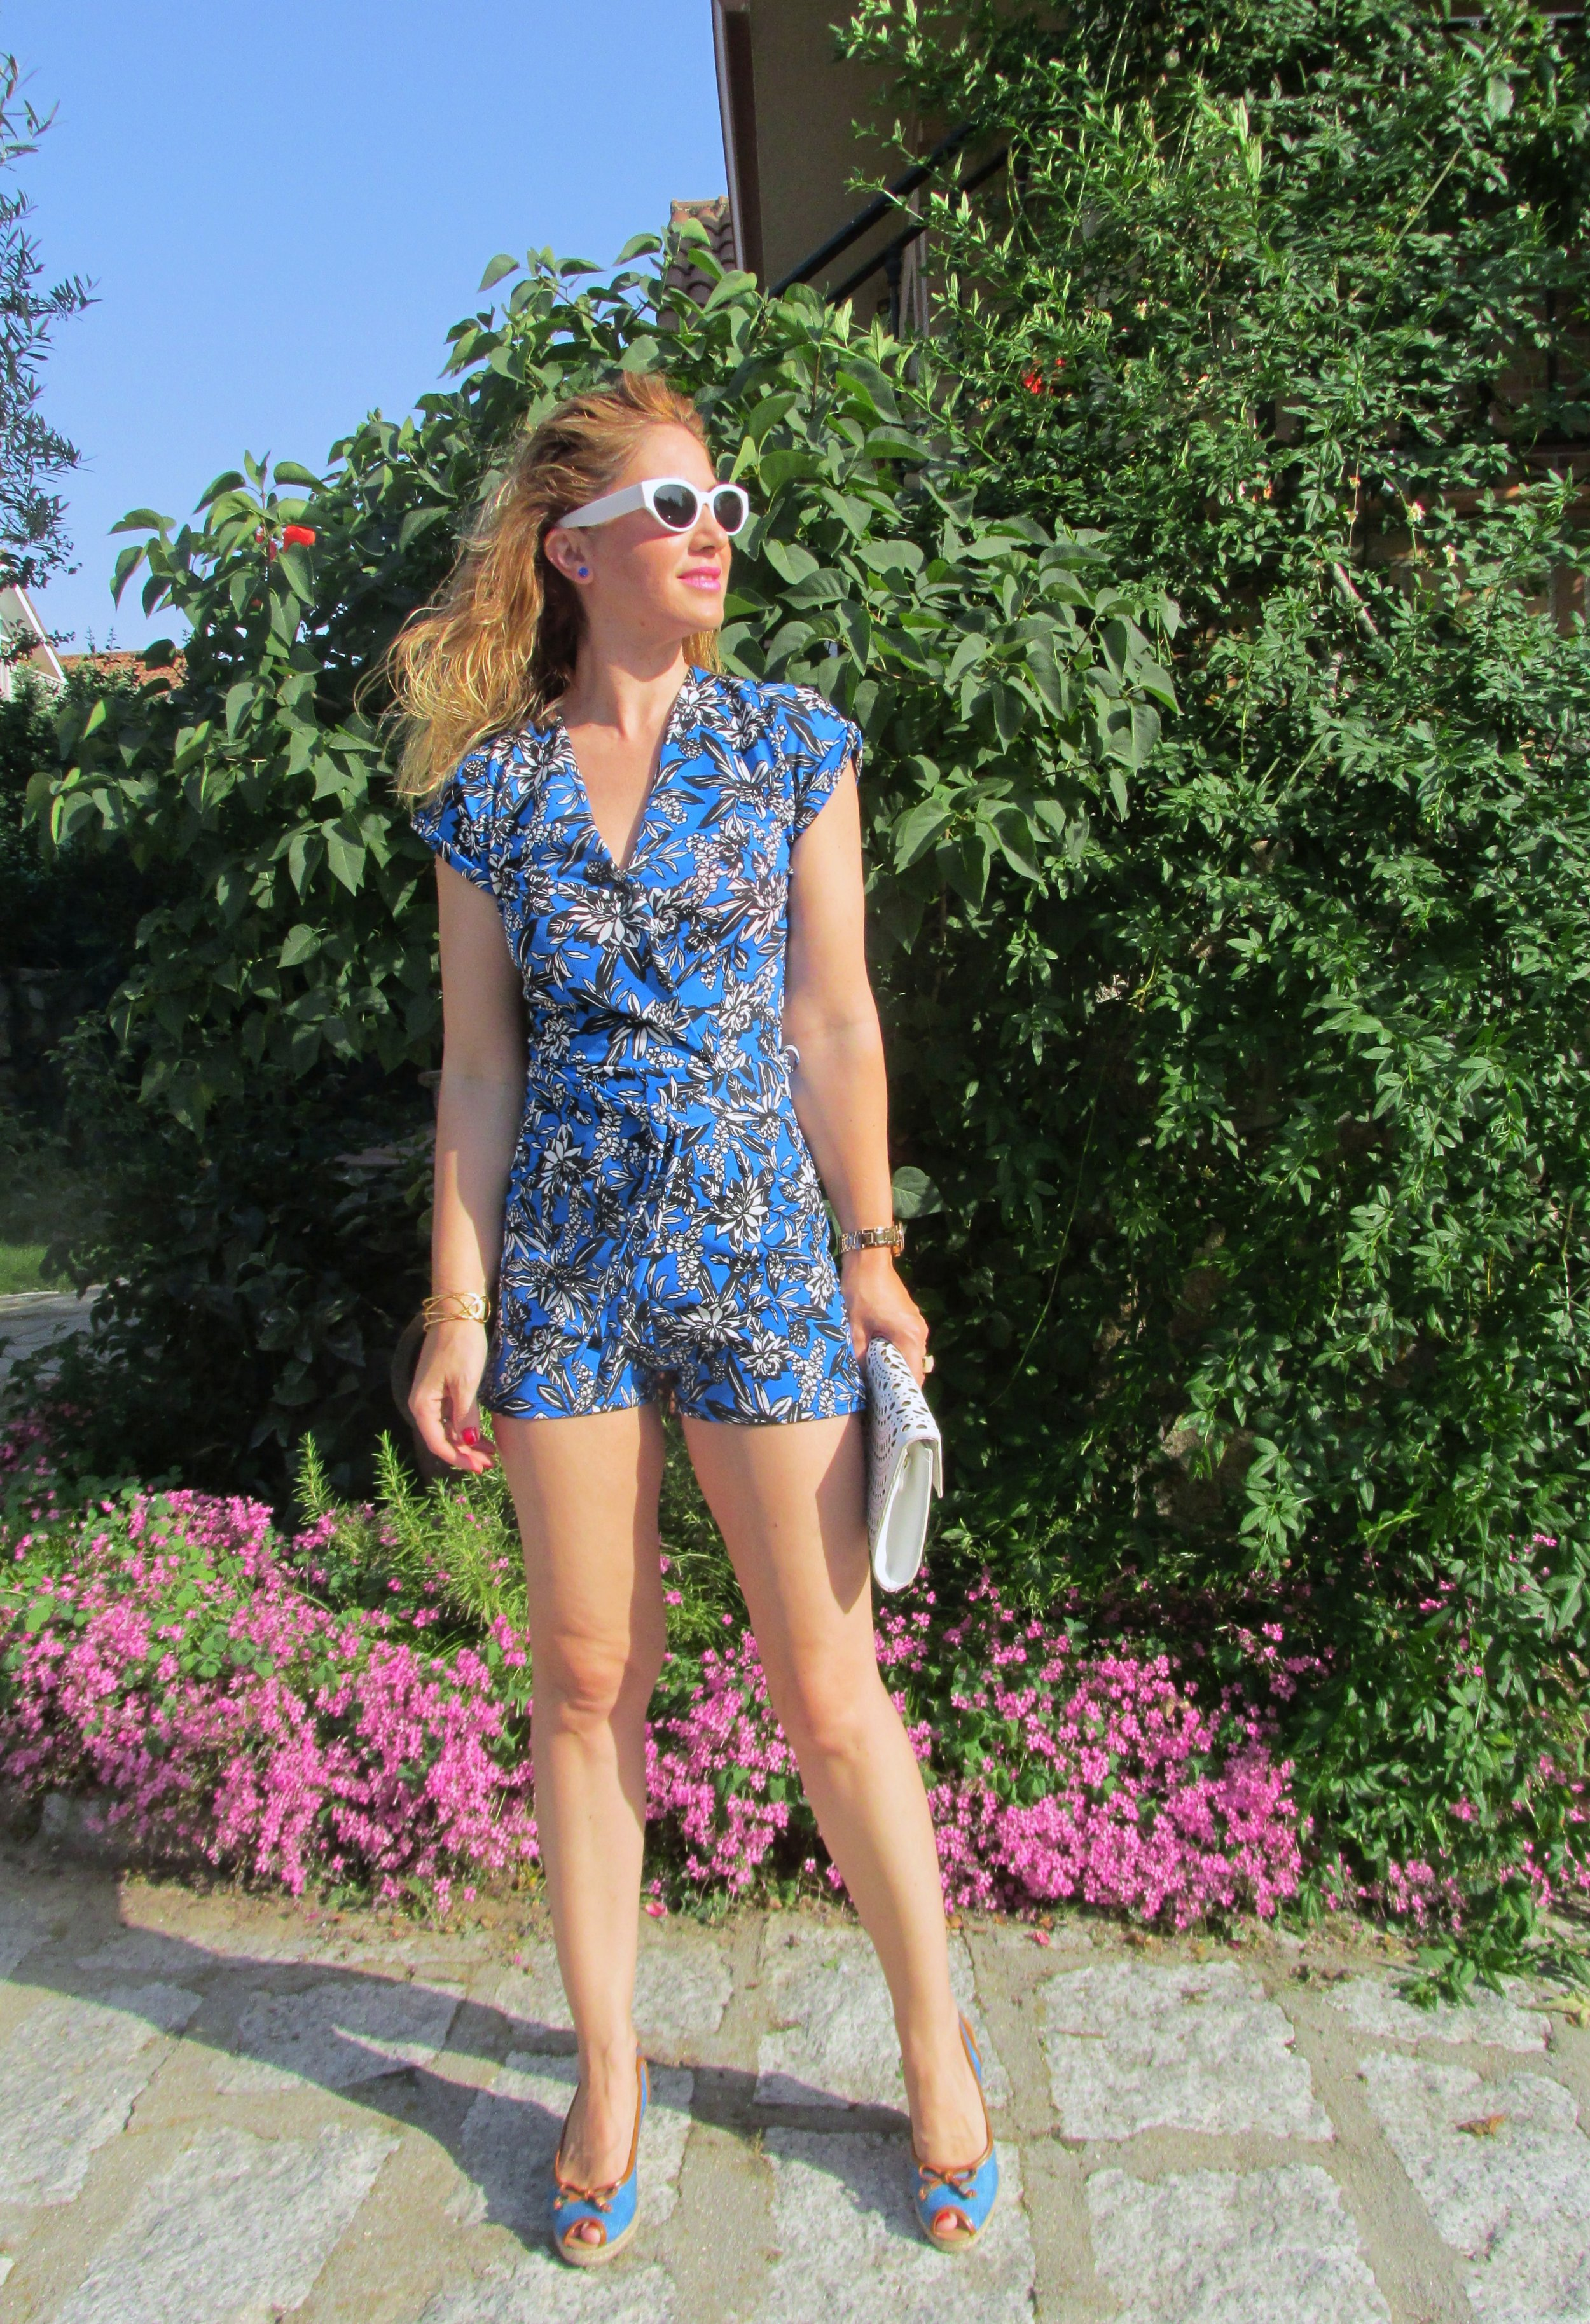 OUTFIT DETAILS: Jumpsuit: Bought in Helsinki, similar  here ; Wedges: CABRERA; Sunnies: ZARA (S/S '18); Bracelet: VIDAL & VIDAL;